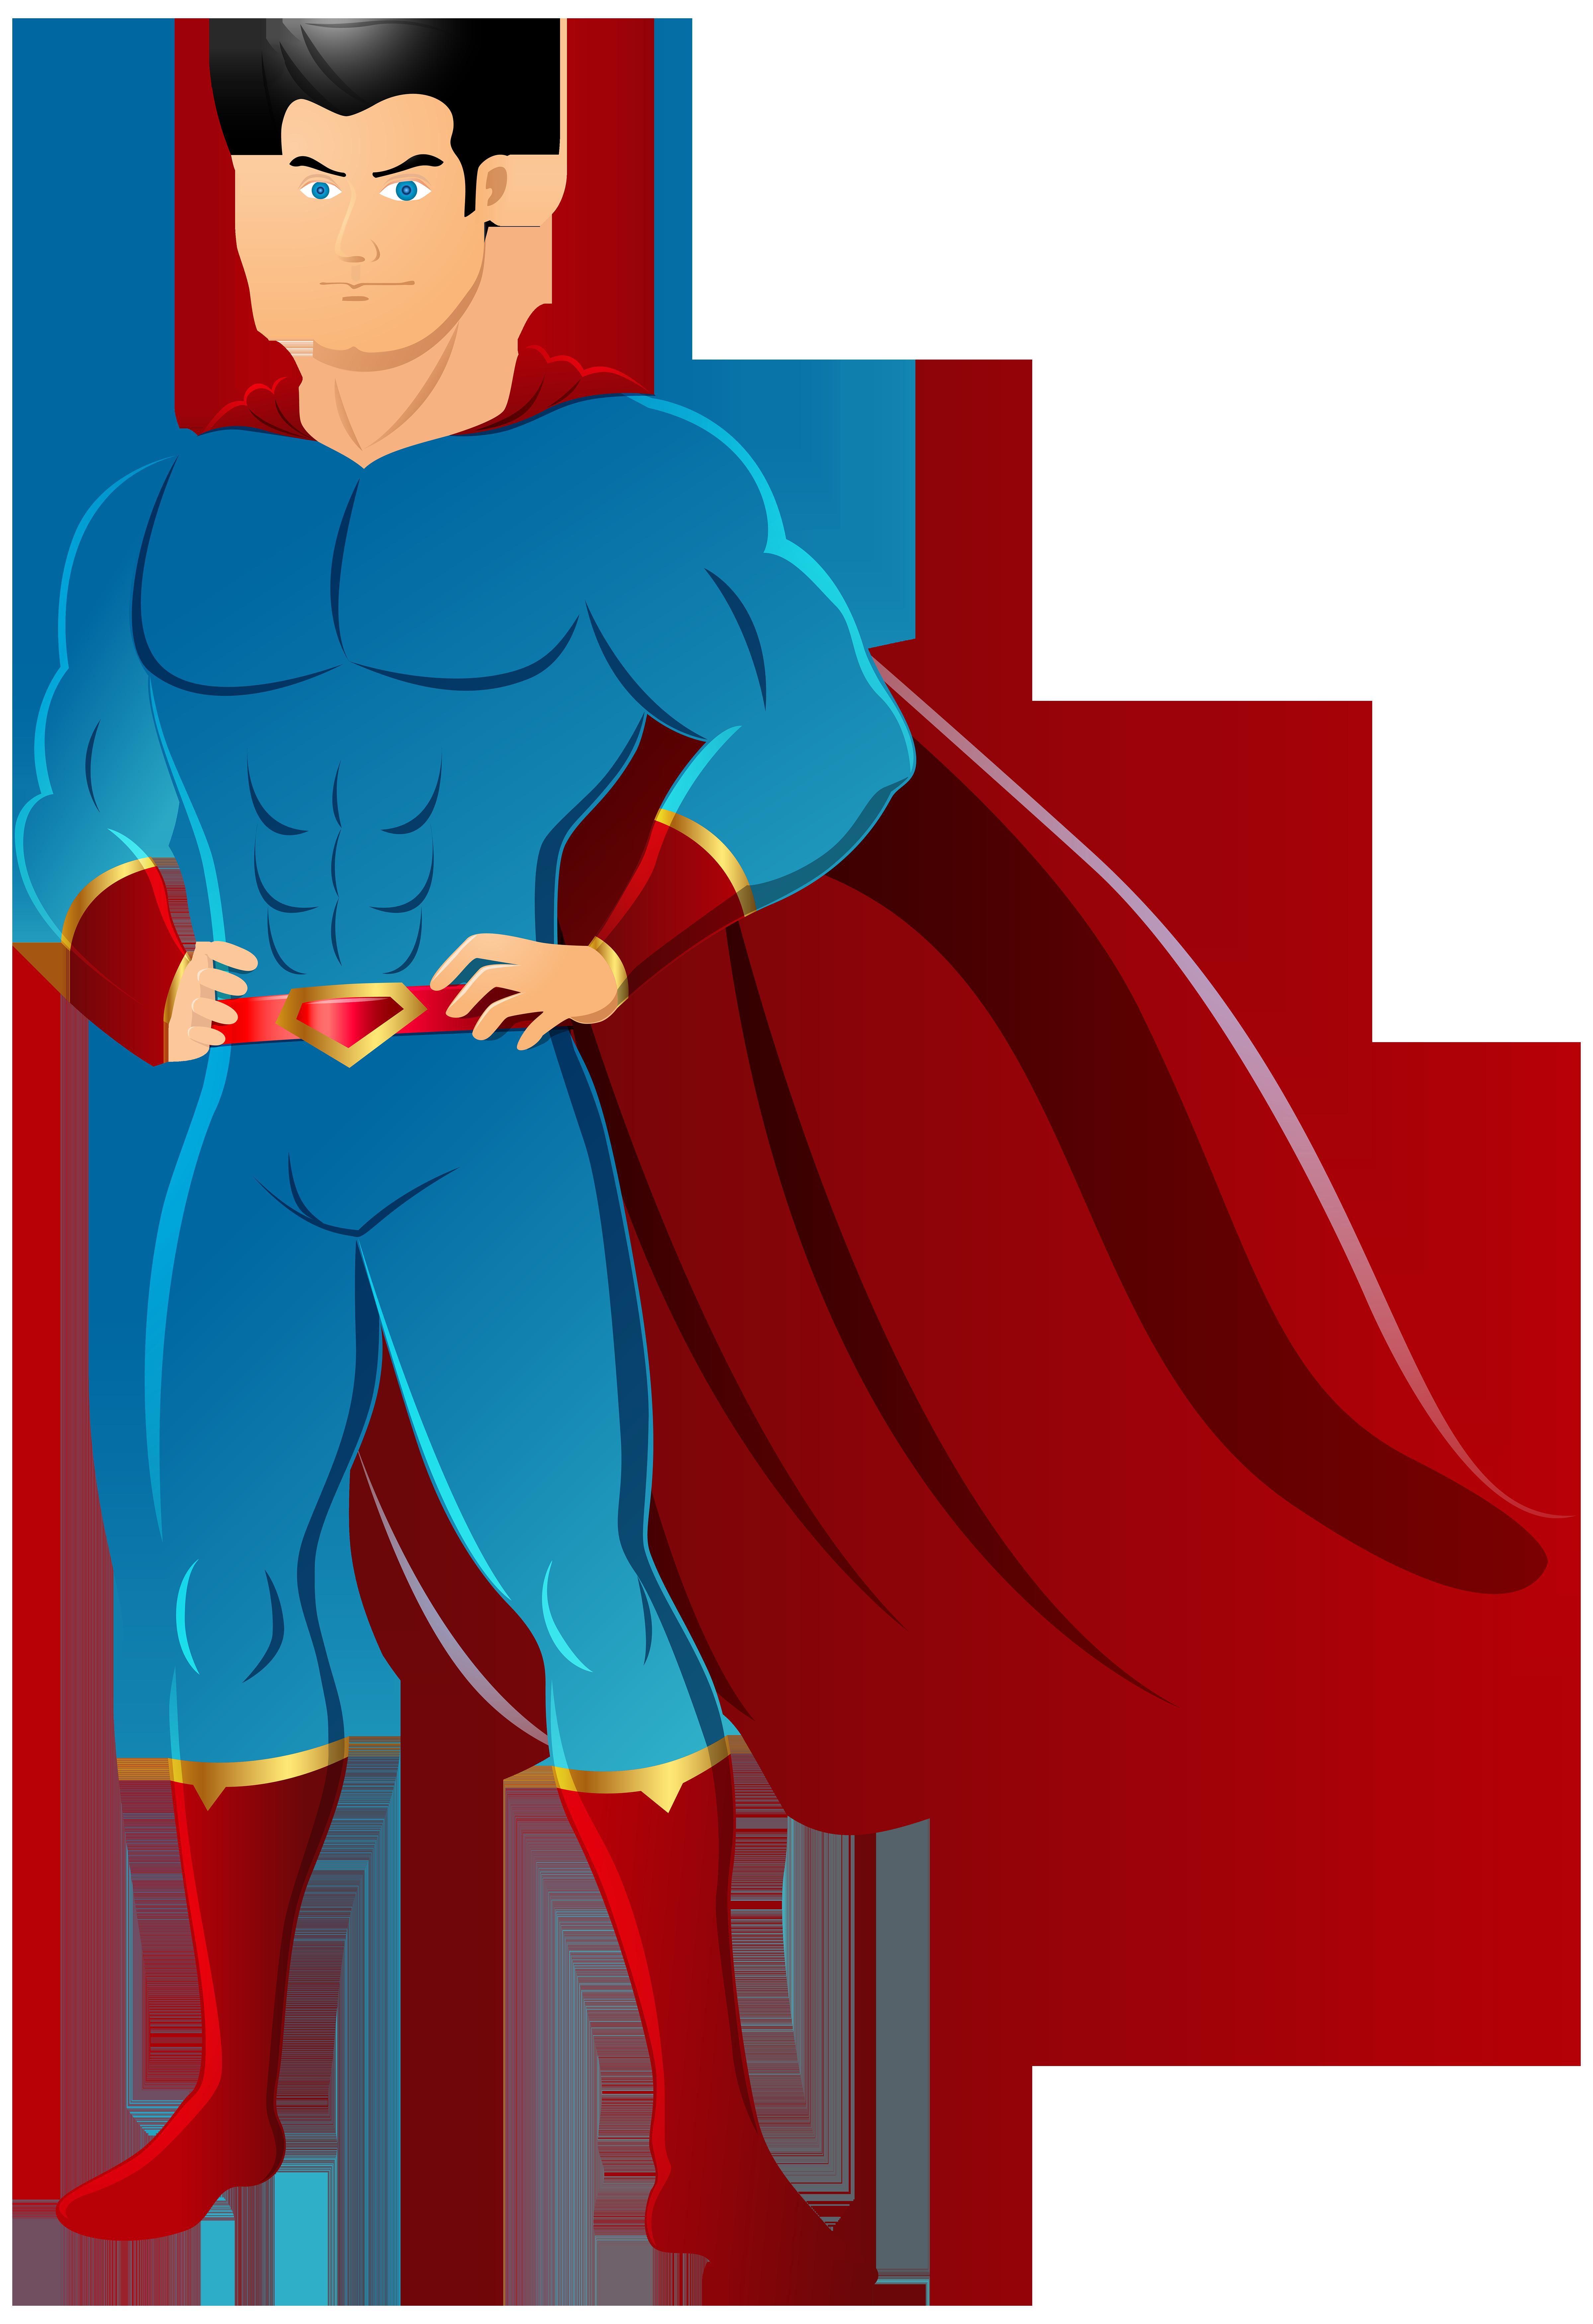 Superhero star clipart graphic transparent download Superhero Transparent PNG Clip Art Image | Gallery Yopriceville ... graphic transparent download